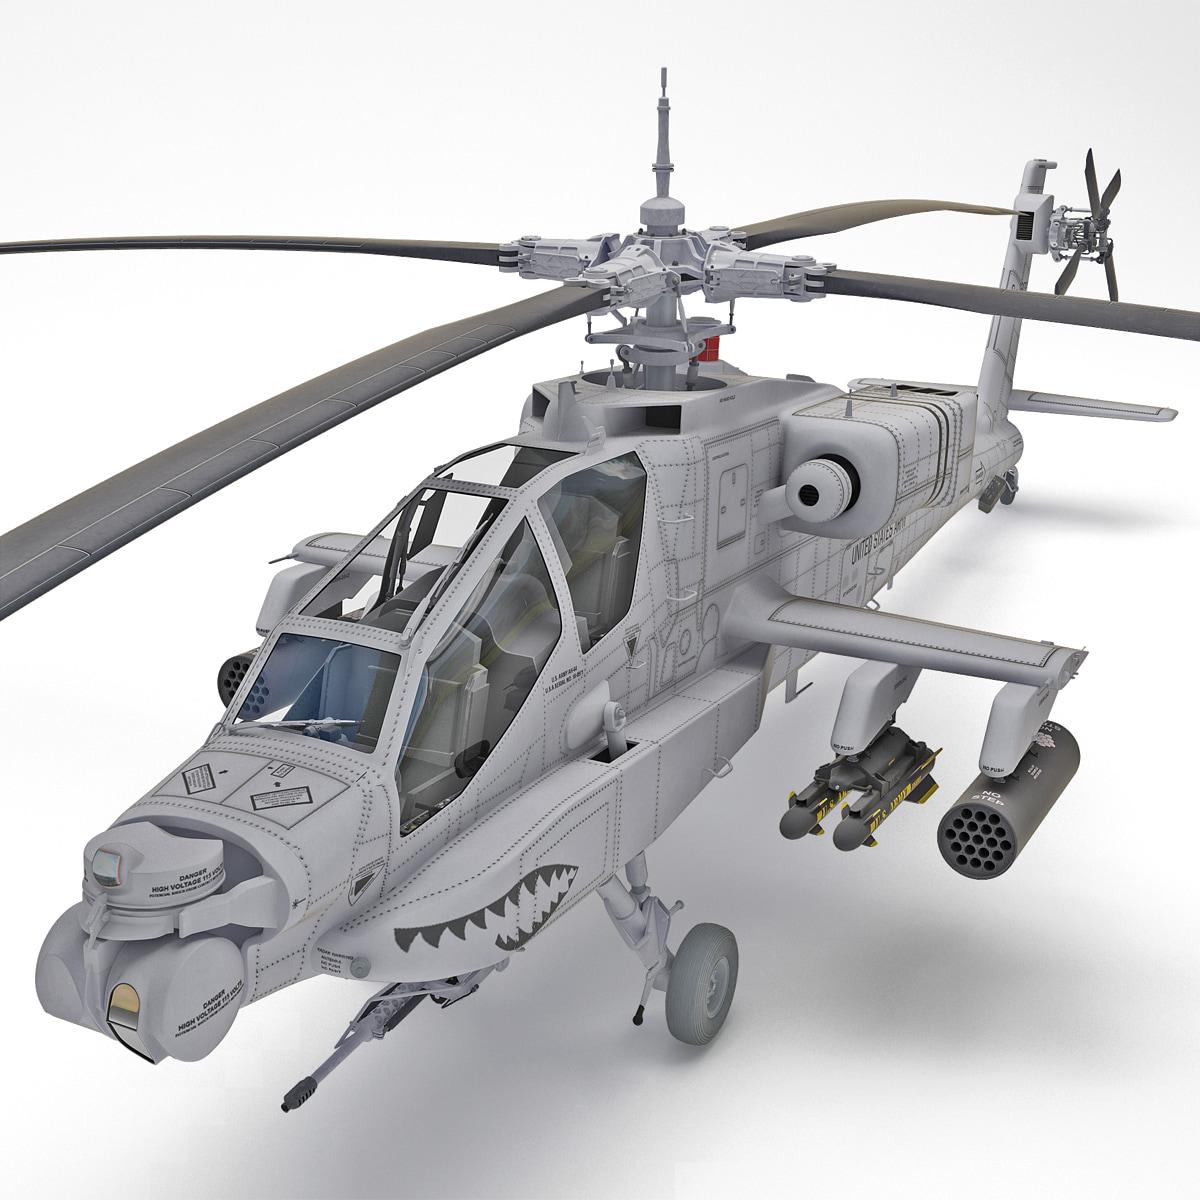 ah-64 apache 2 helicopter 3d obj